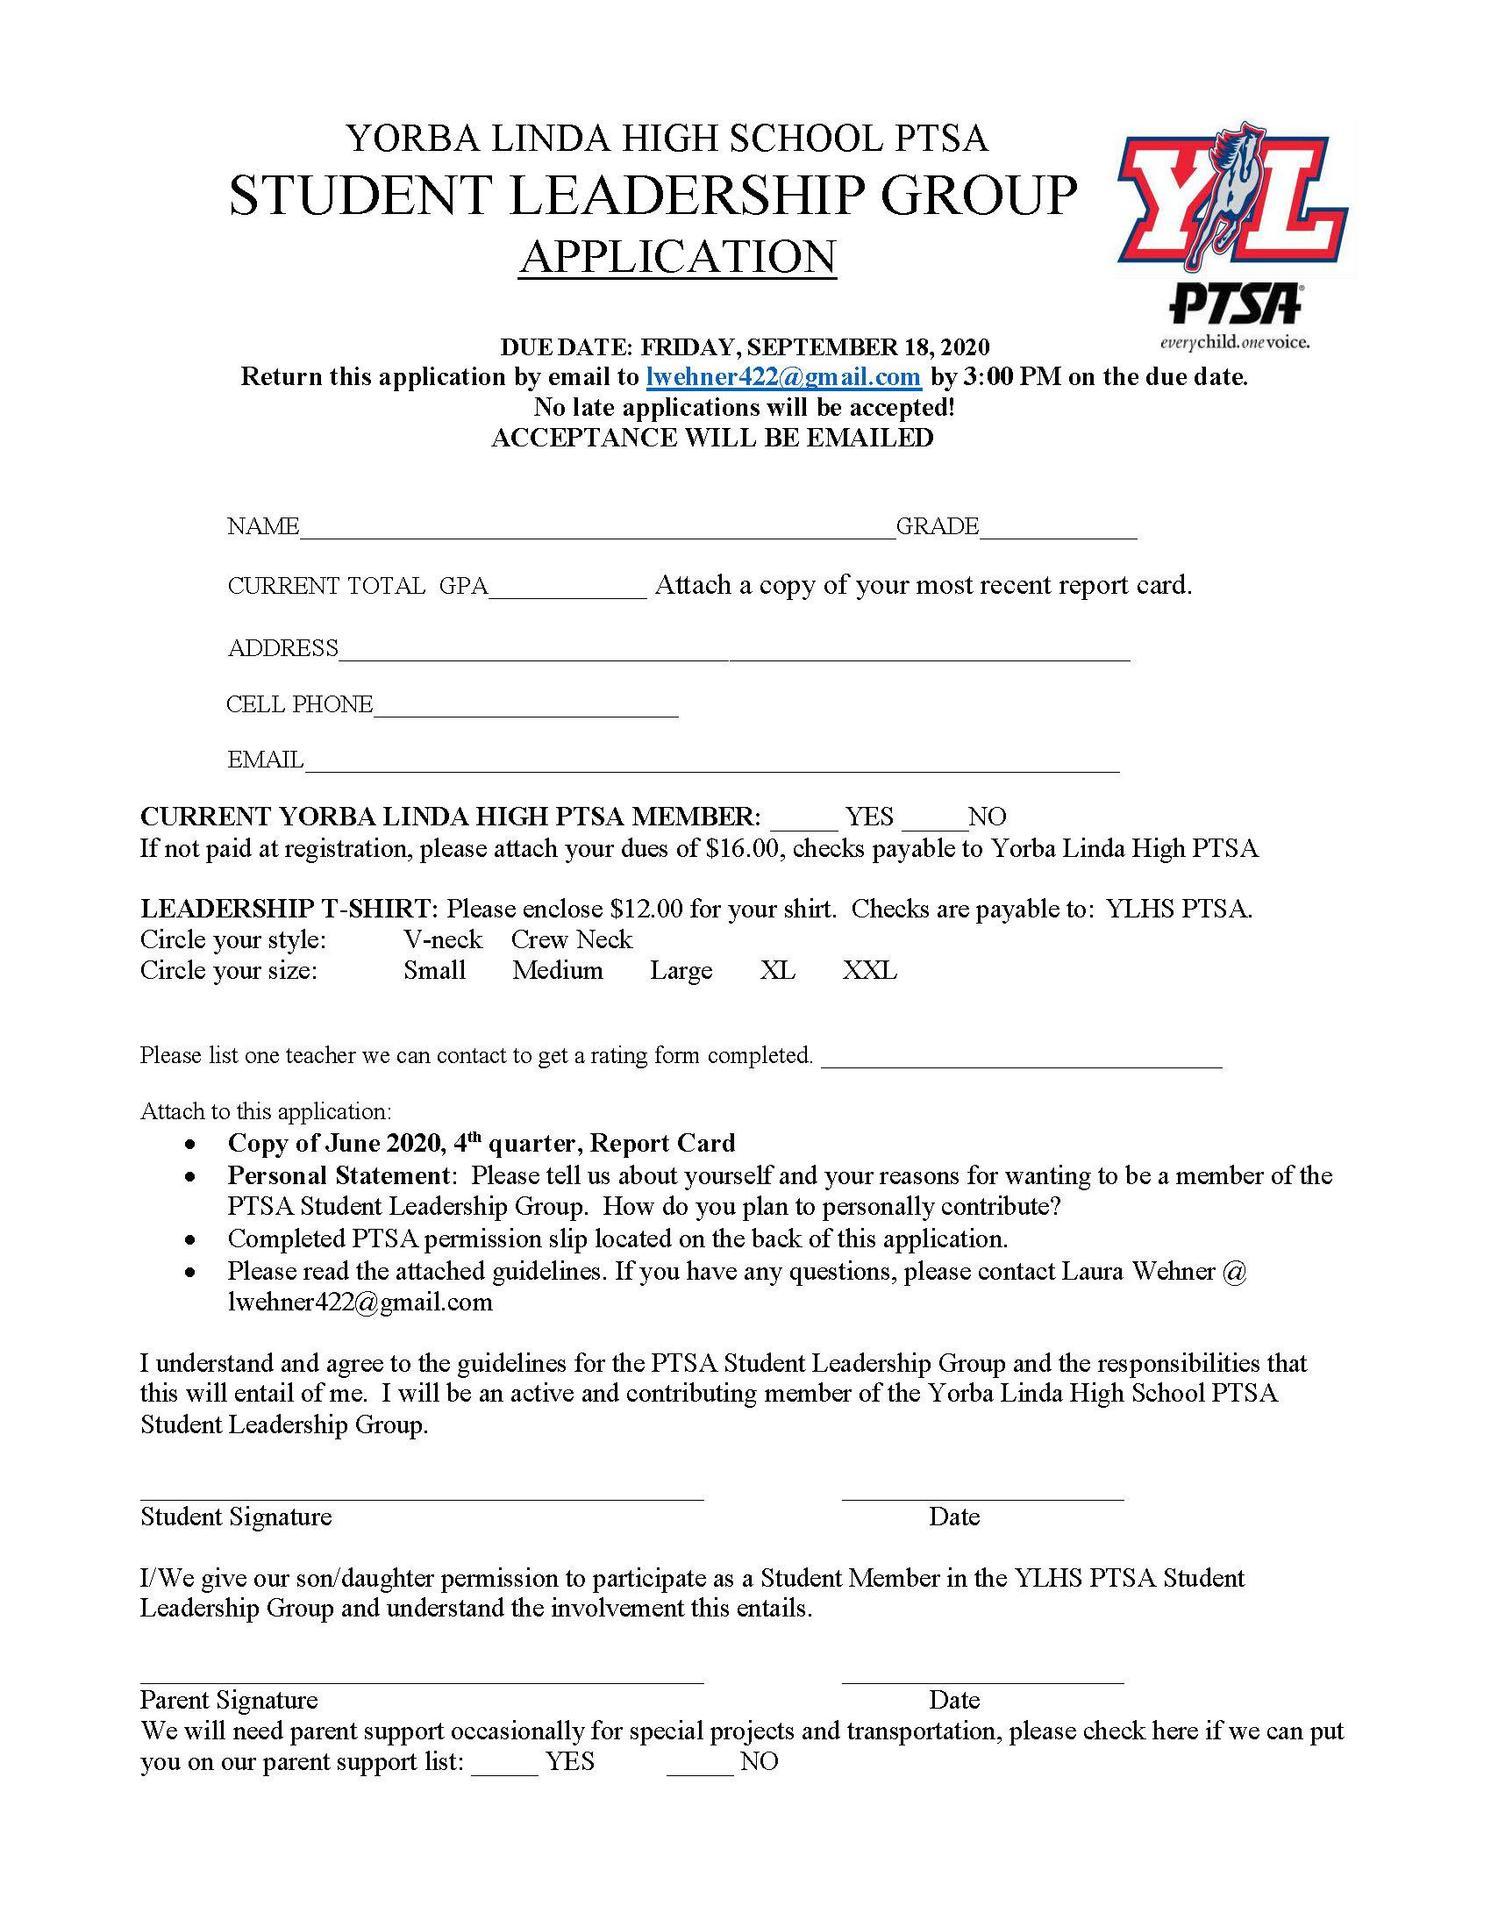 2020-2021 PTSA Student Leadership Application